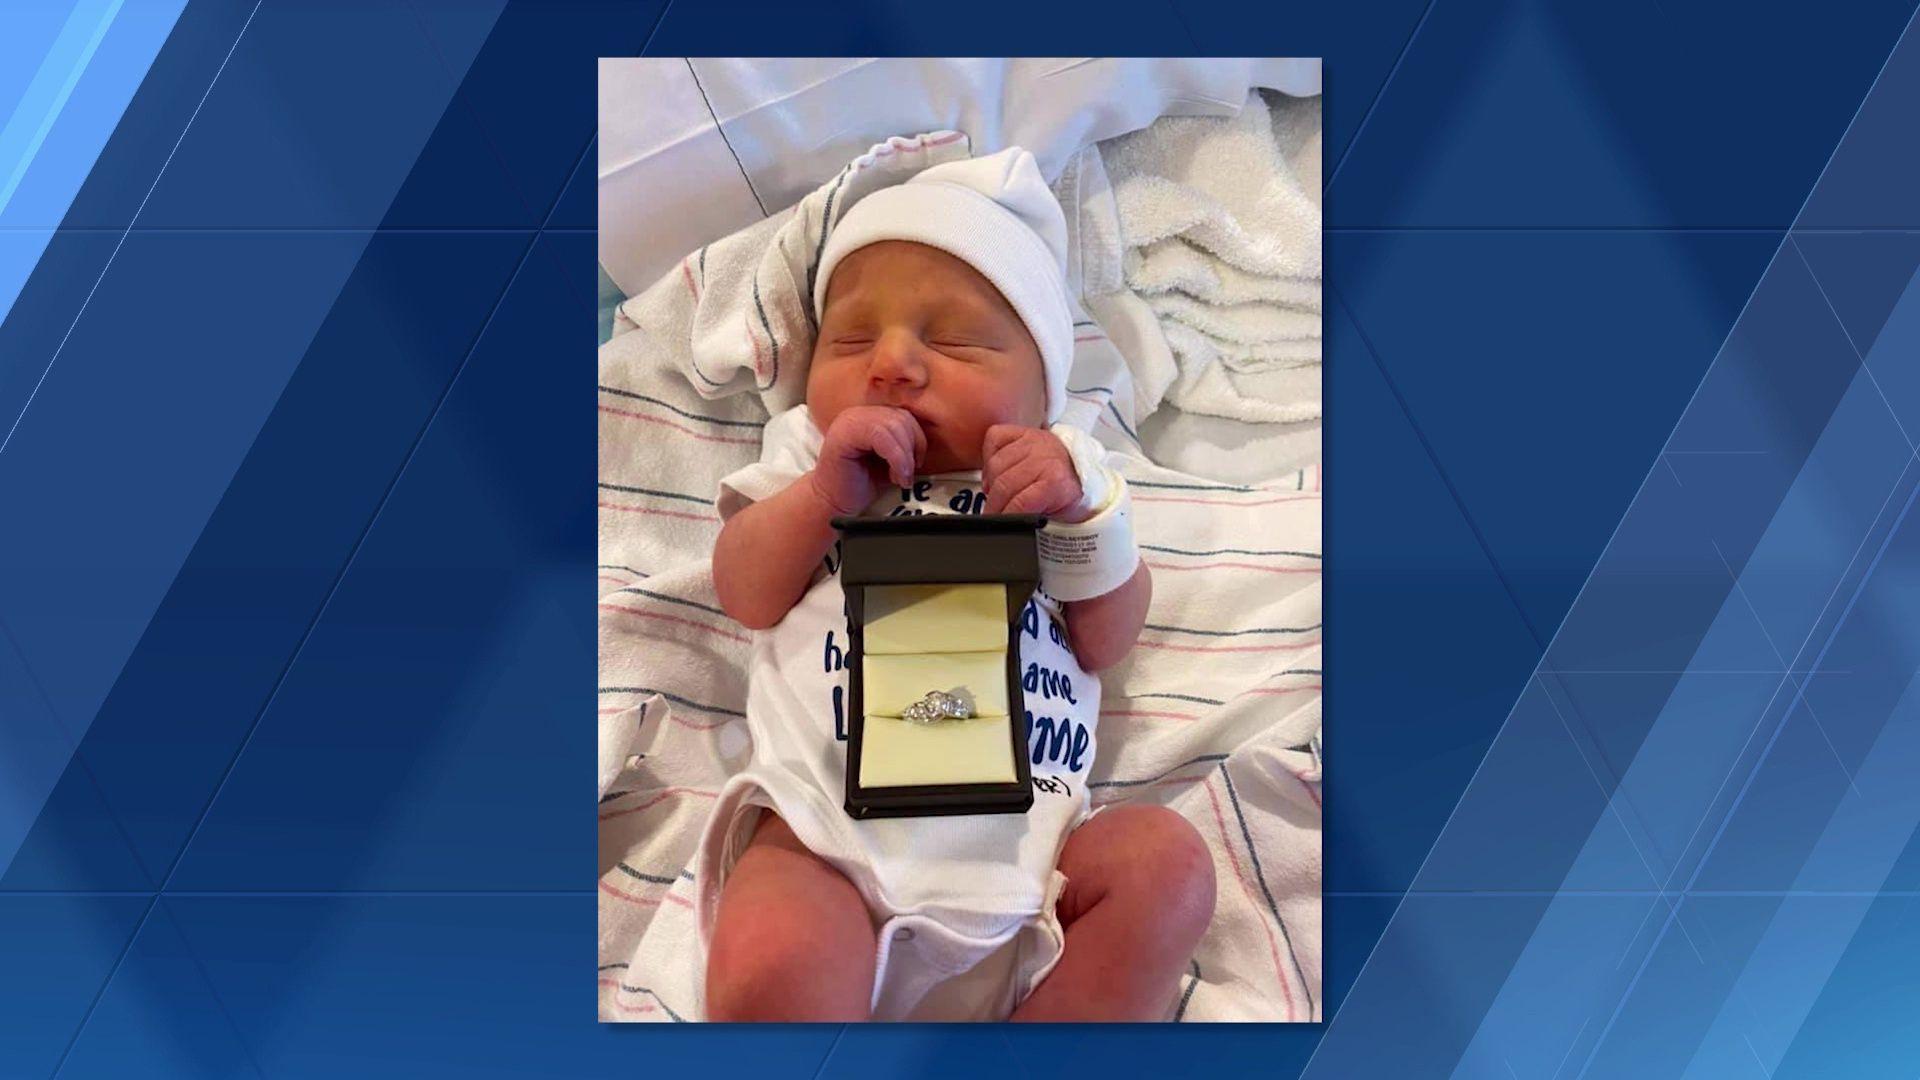 Massachusetts newborn helps dad with maternity ward proposal